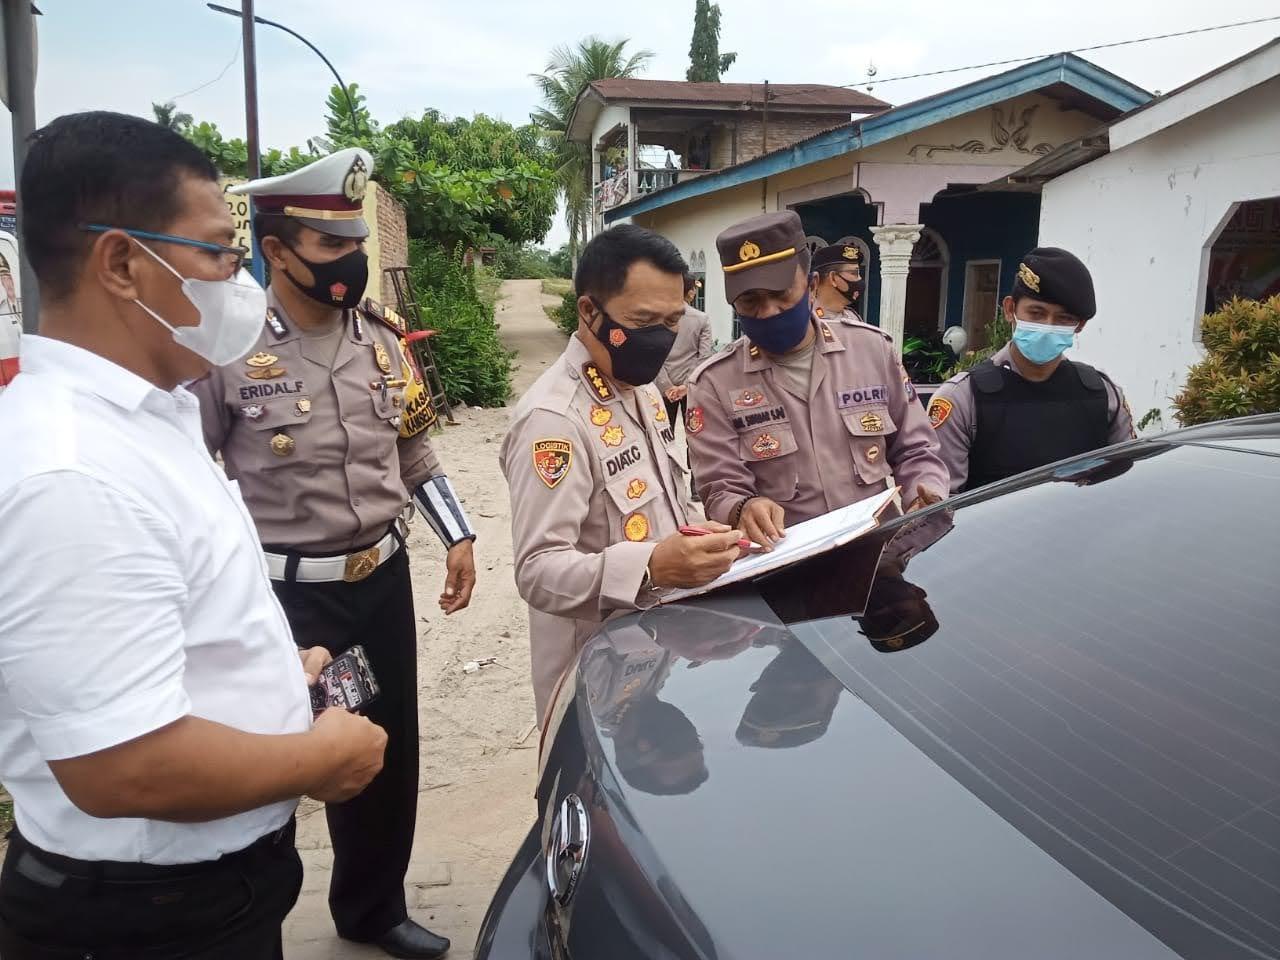 Pamatwil Polda Sumut Lakukan Pengecekan Pos Penyekatan di Wilayah Batu Bara